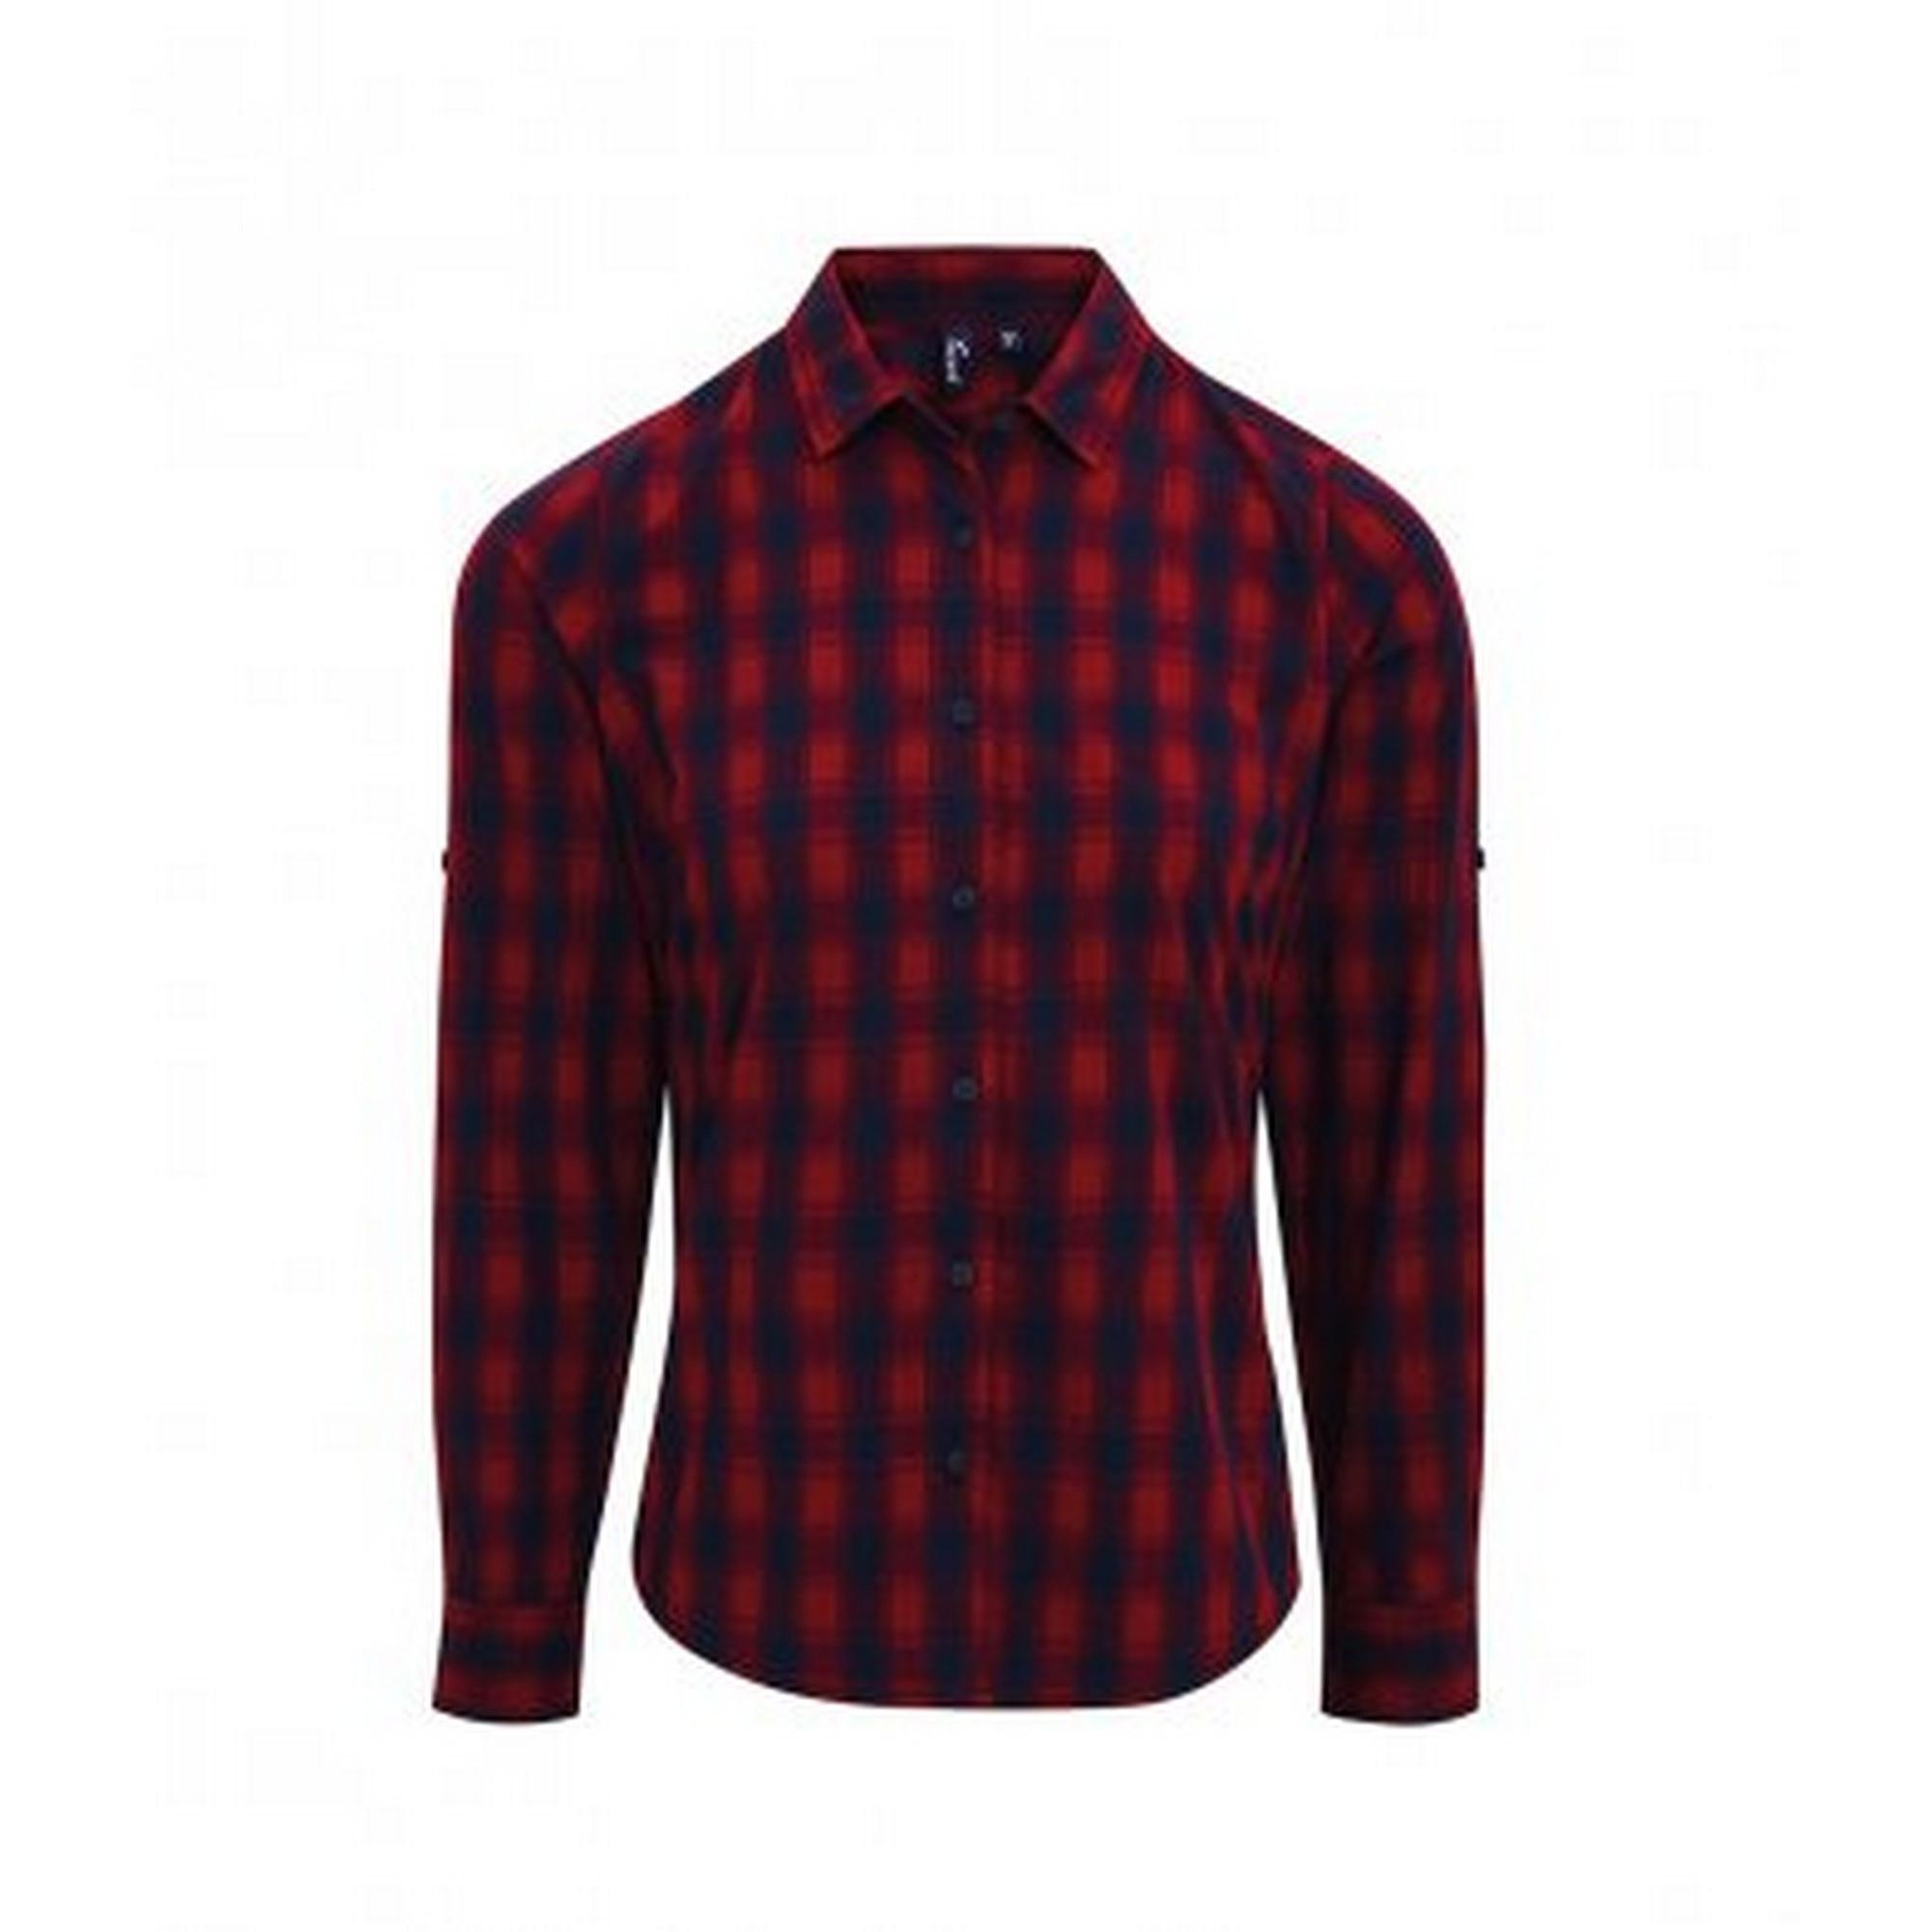 Premier-Camisa-a-cuadros-con-manga-larga-modelo-Mulligan-para-mujer-PC3104